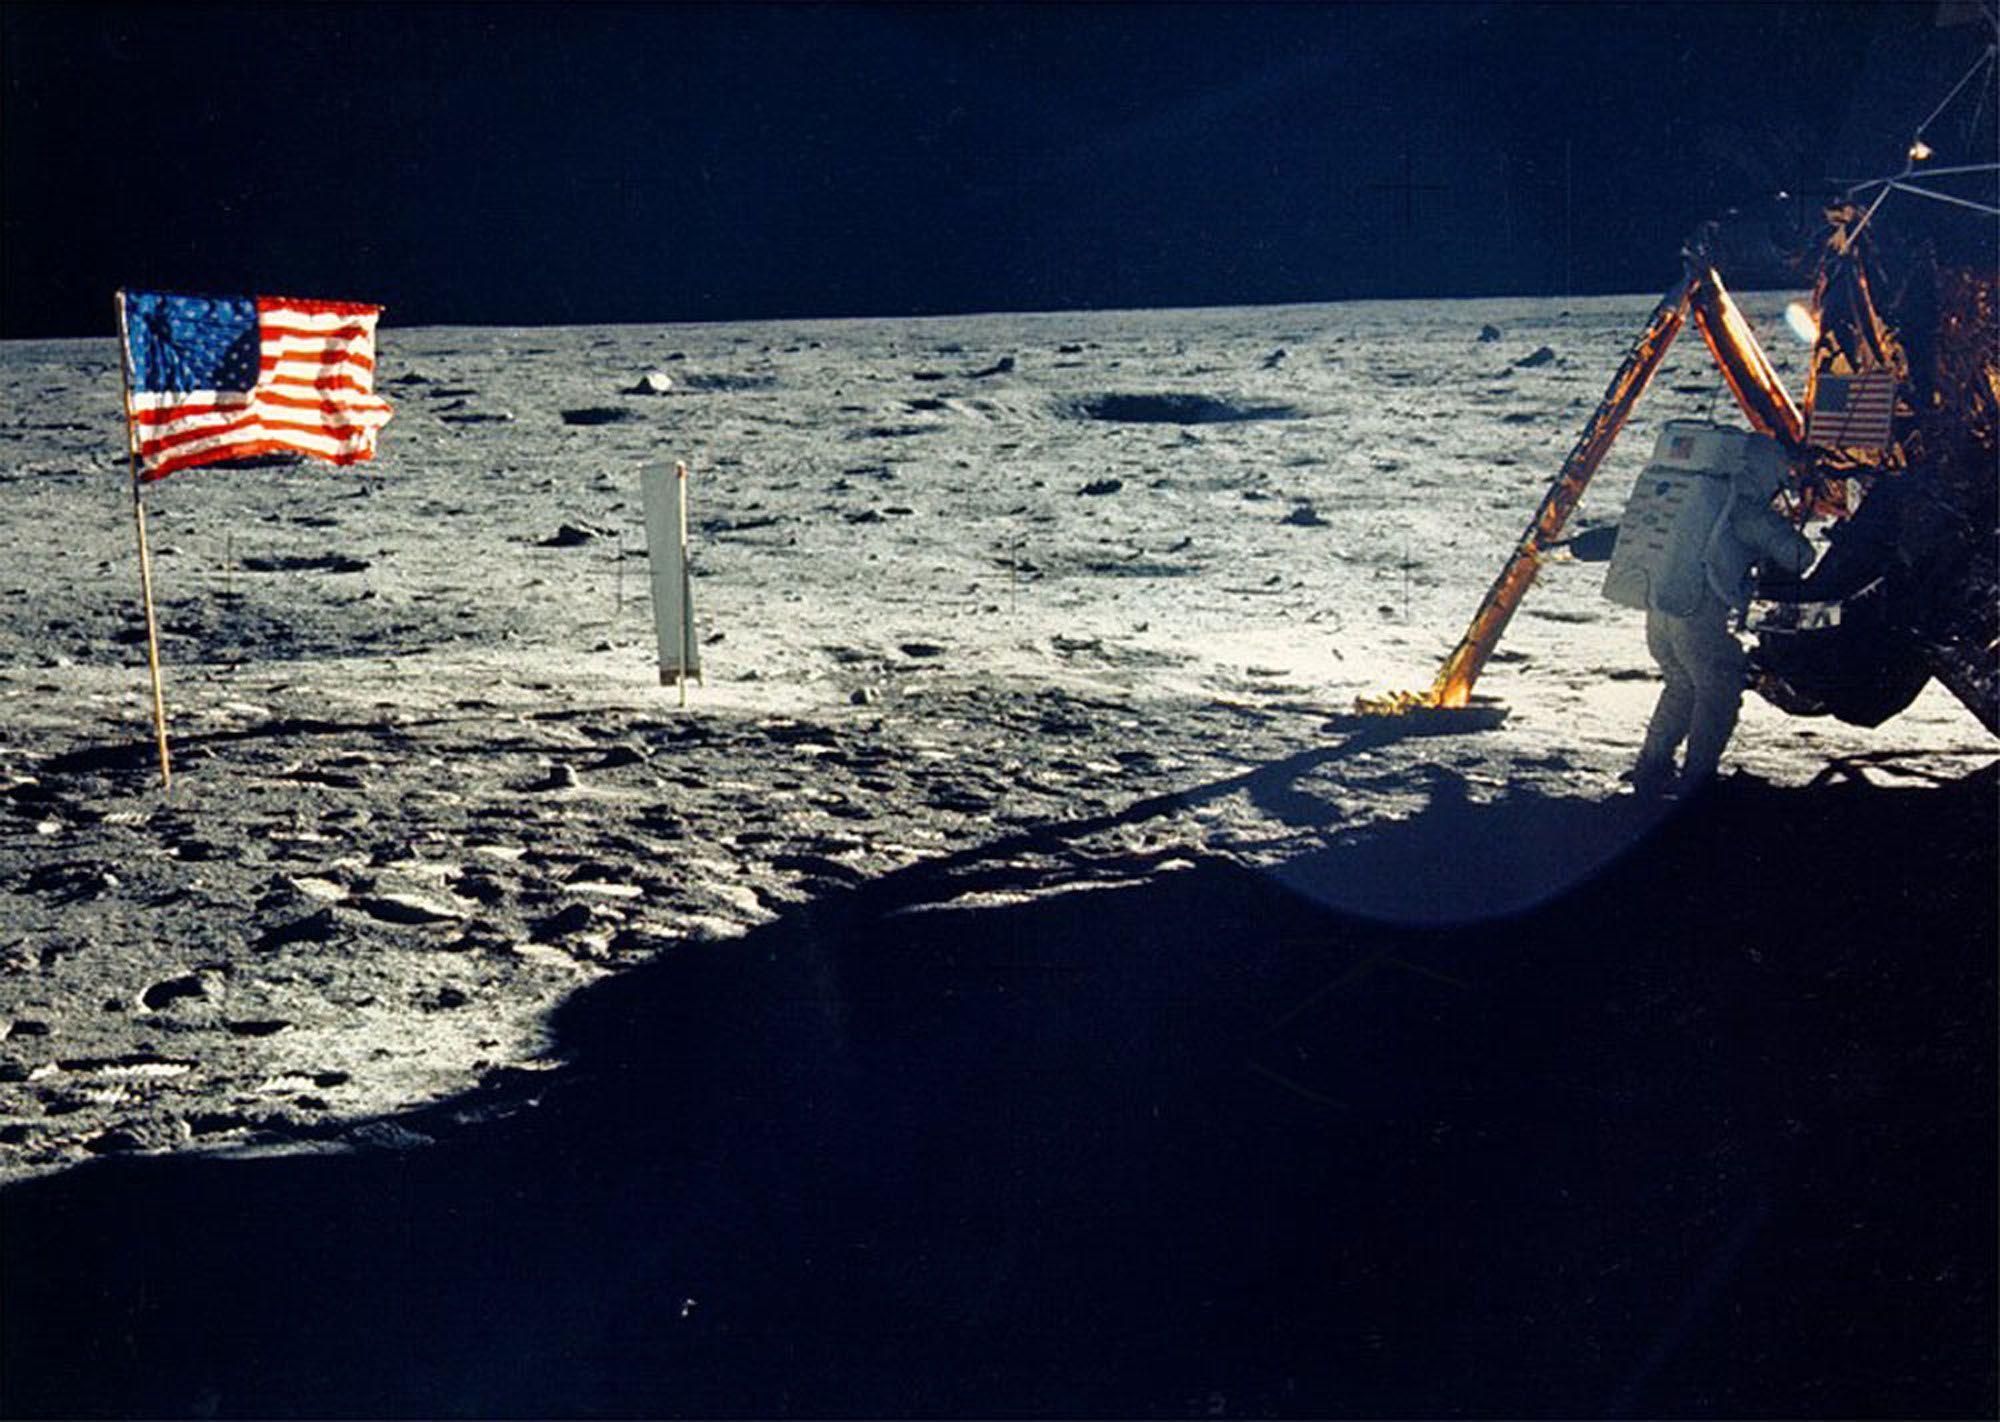 A Rare Lot Of NASA Photographs Is Hitting The Auction Block This November